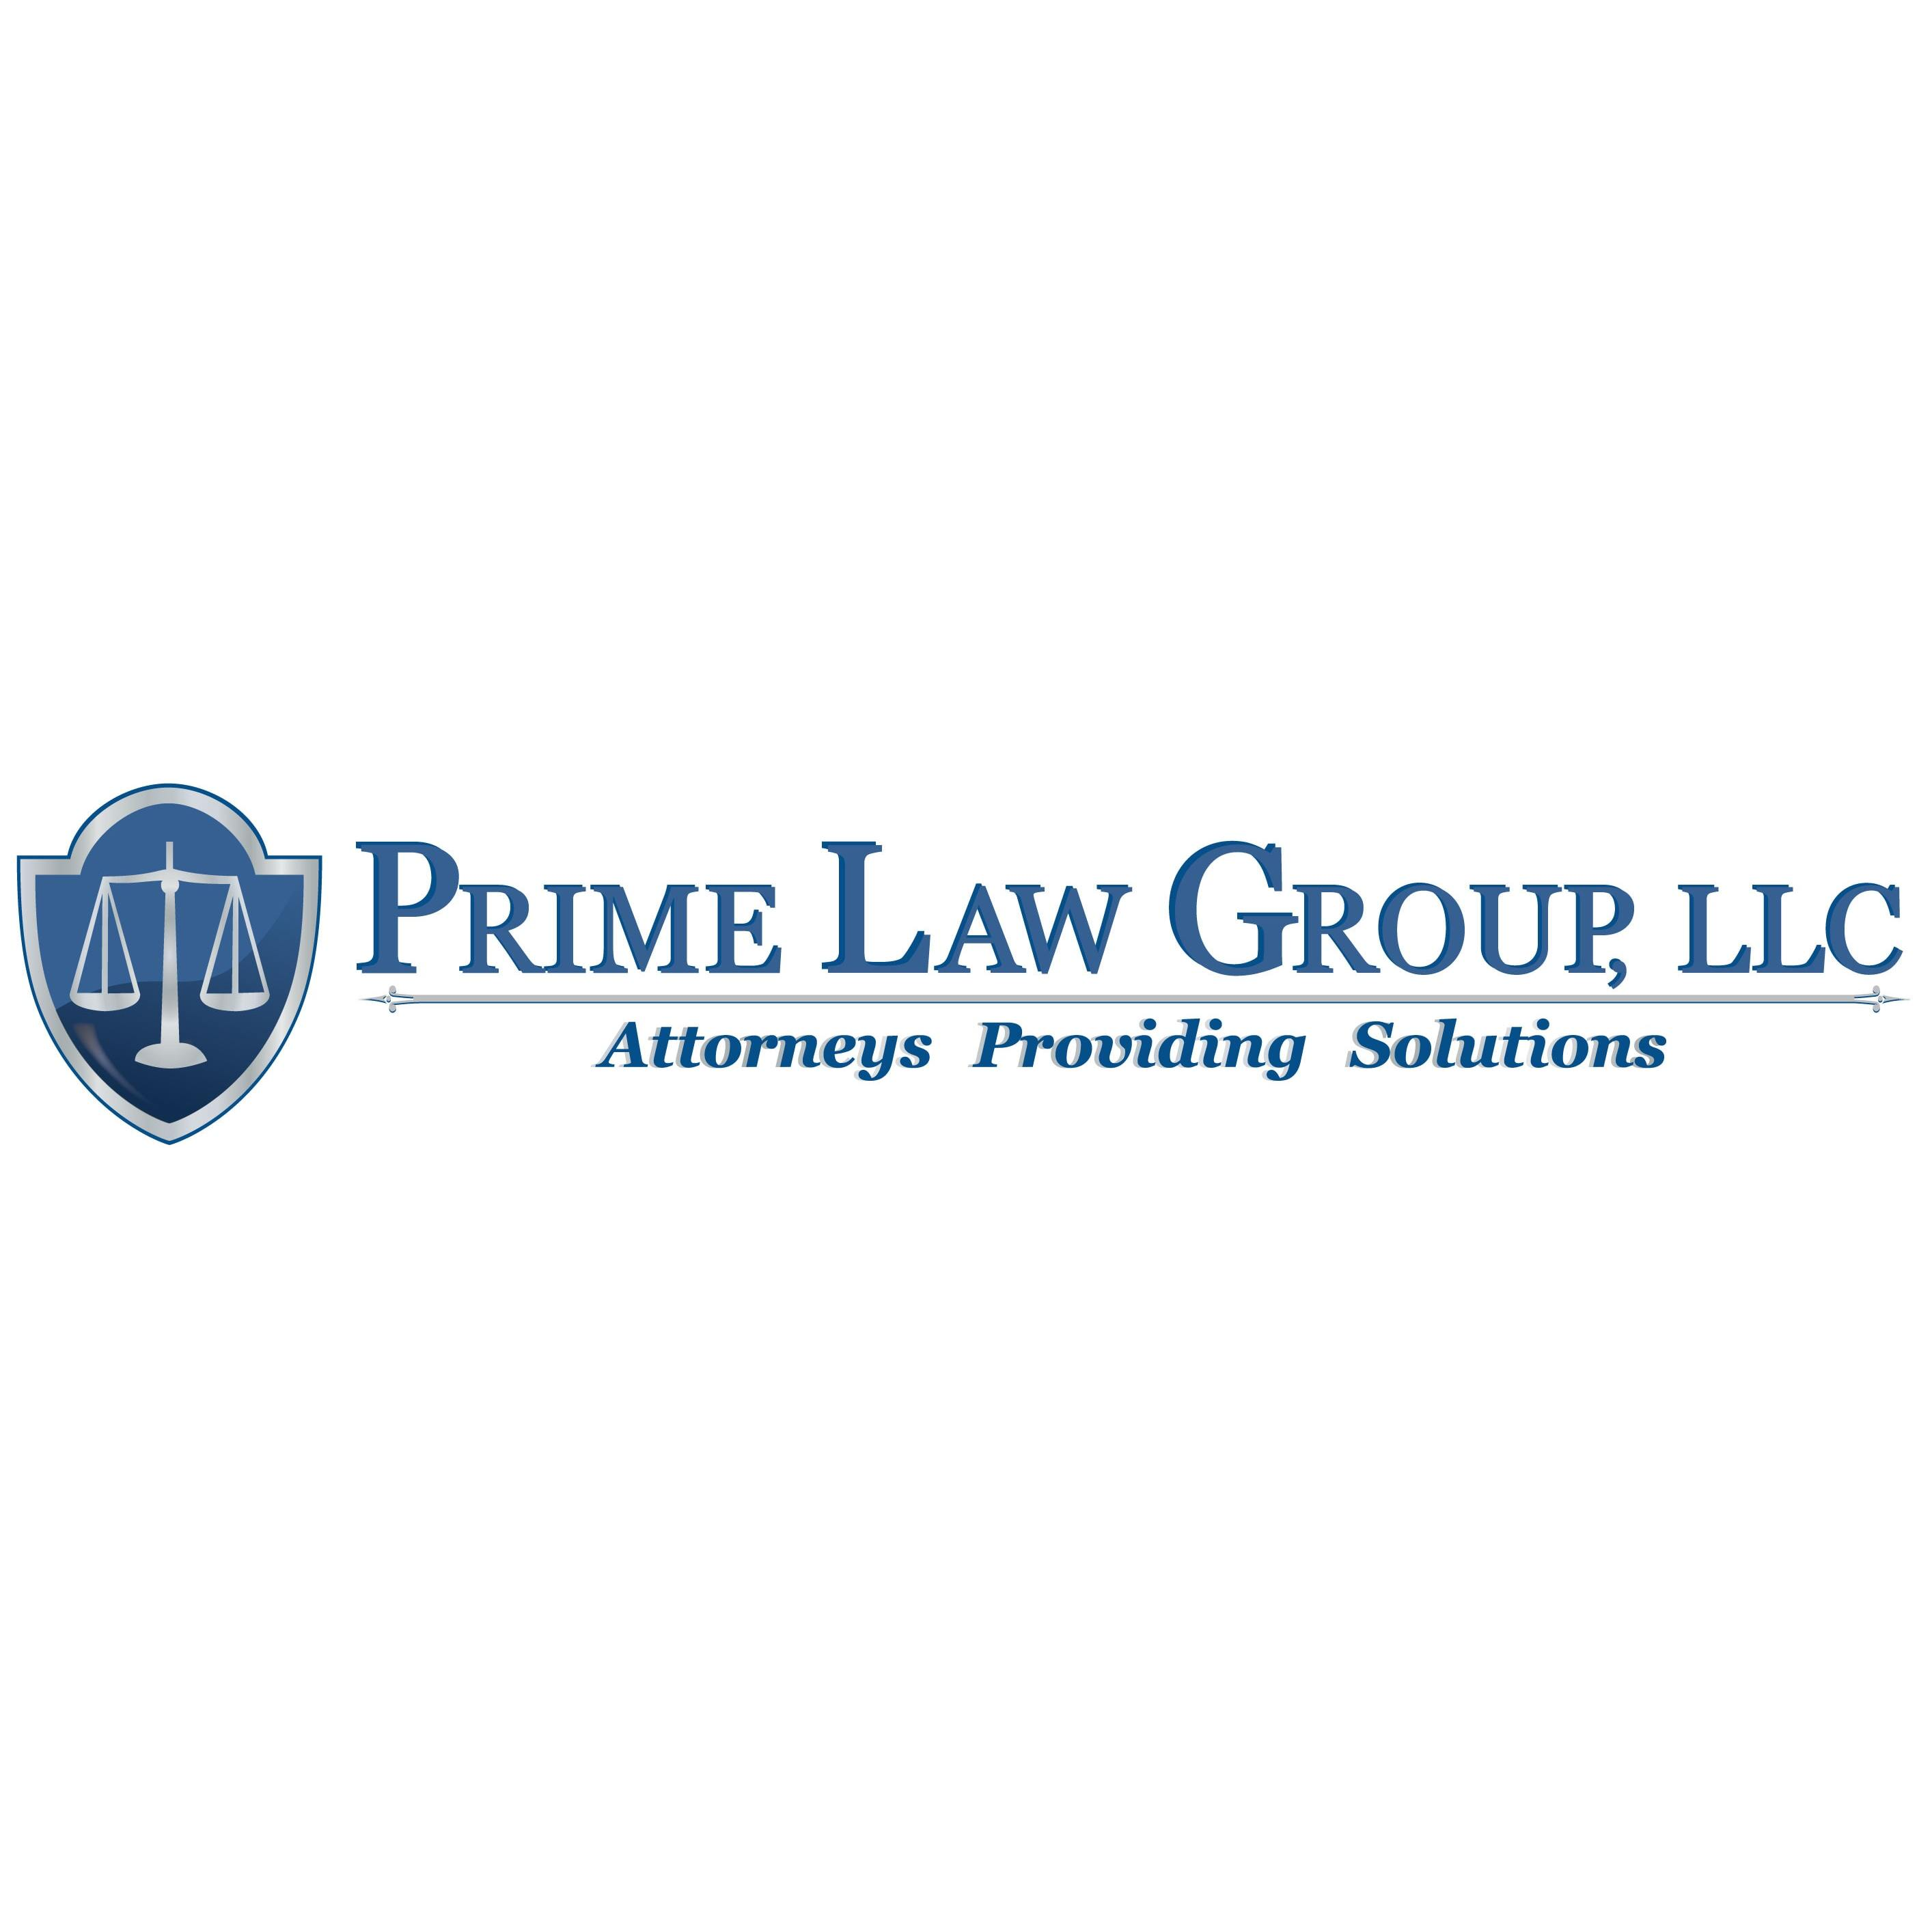 Prime Law Group, LLC